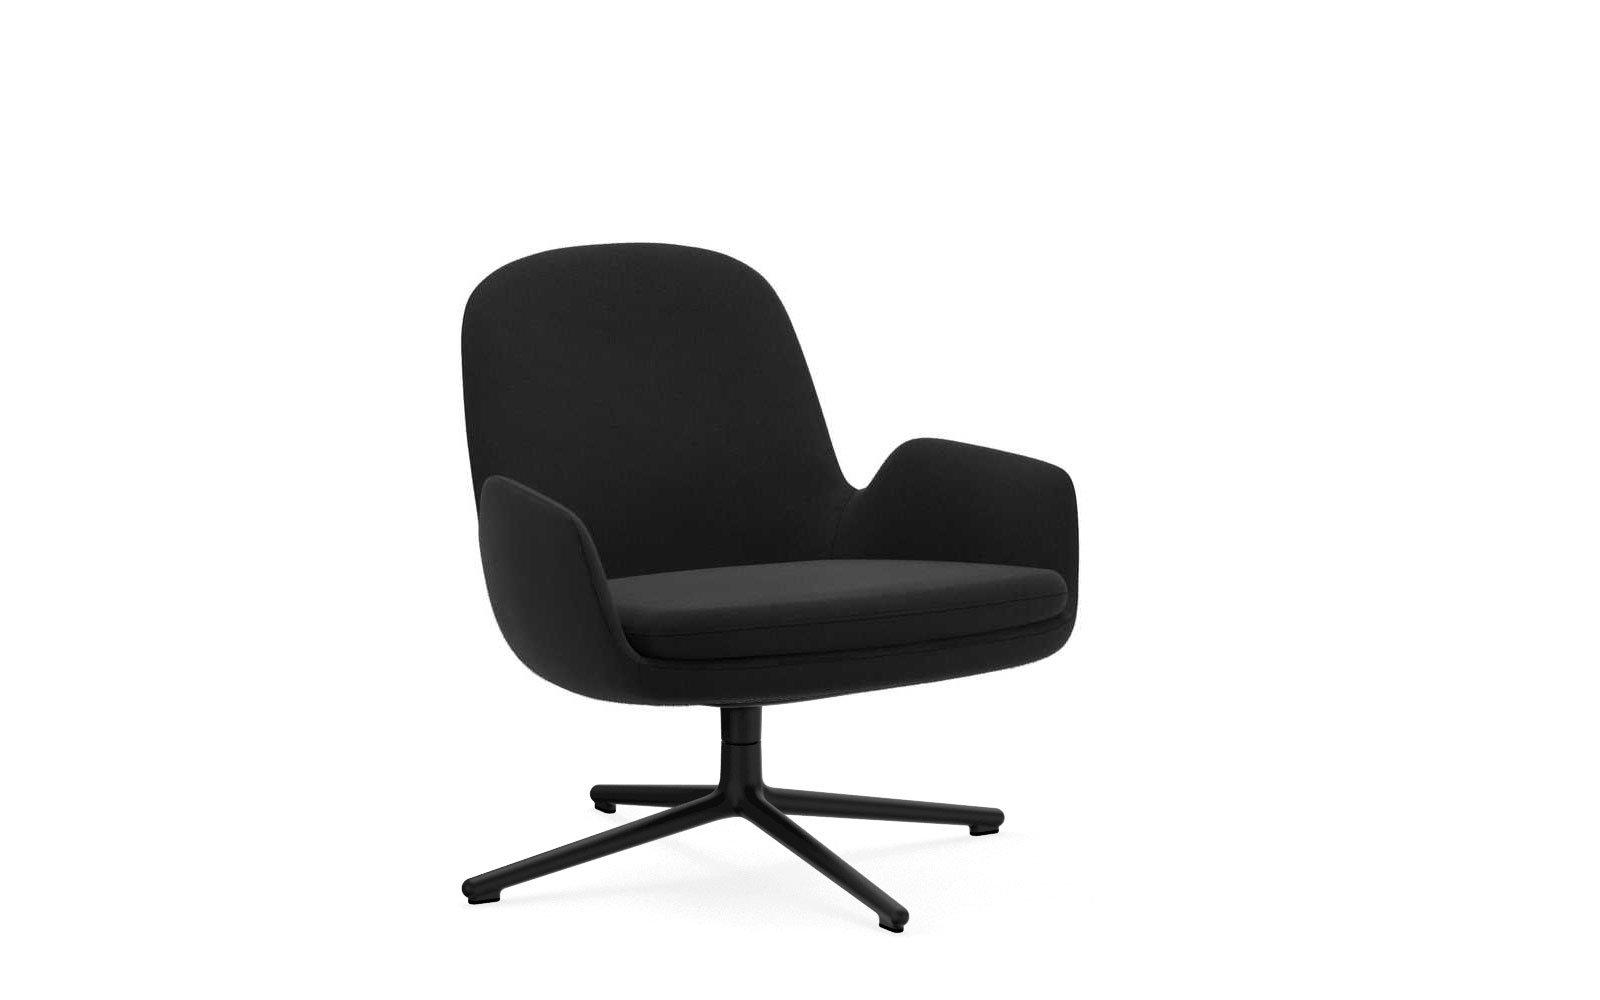 Phenomenal Era Low Lounge Chair With Swivel Base Ibusinesslaw Wood Chair Design Ideas Ibusinesslaworg